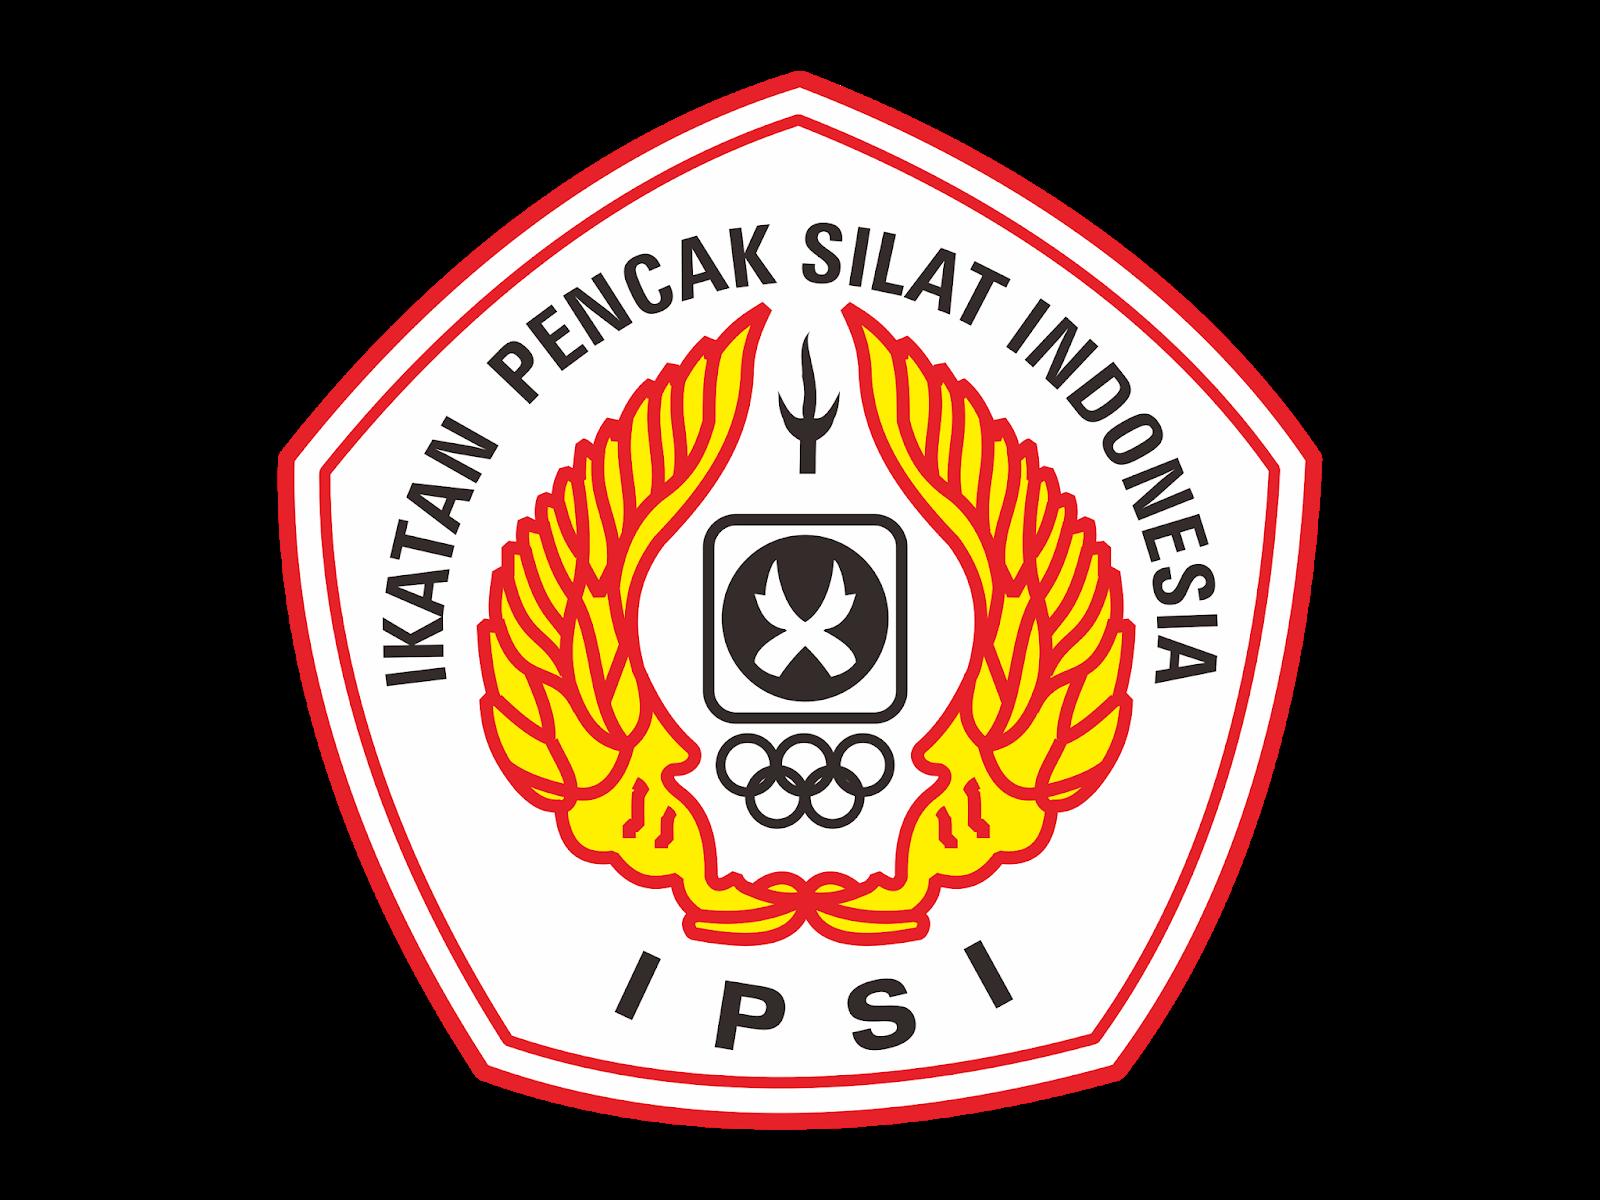 Silat logo